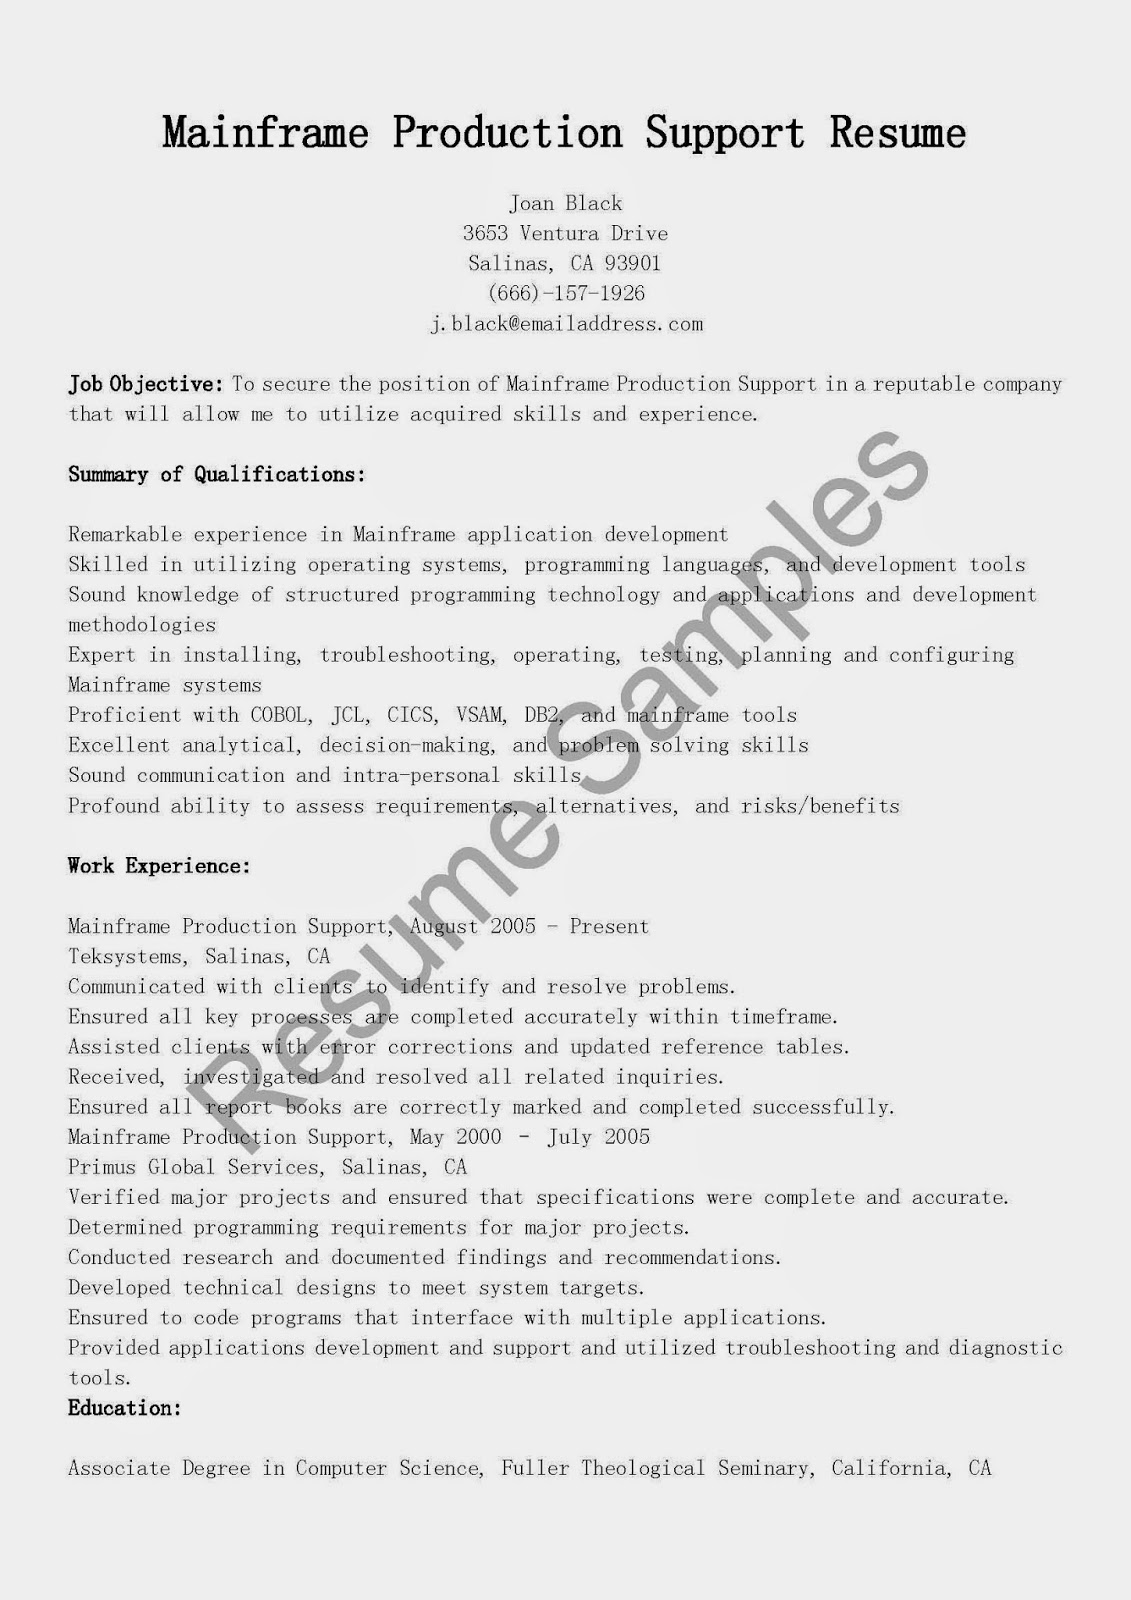 Resume Samples Mainframe Production Support Resume Sample